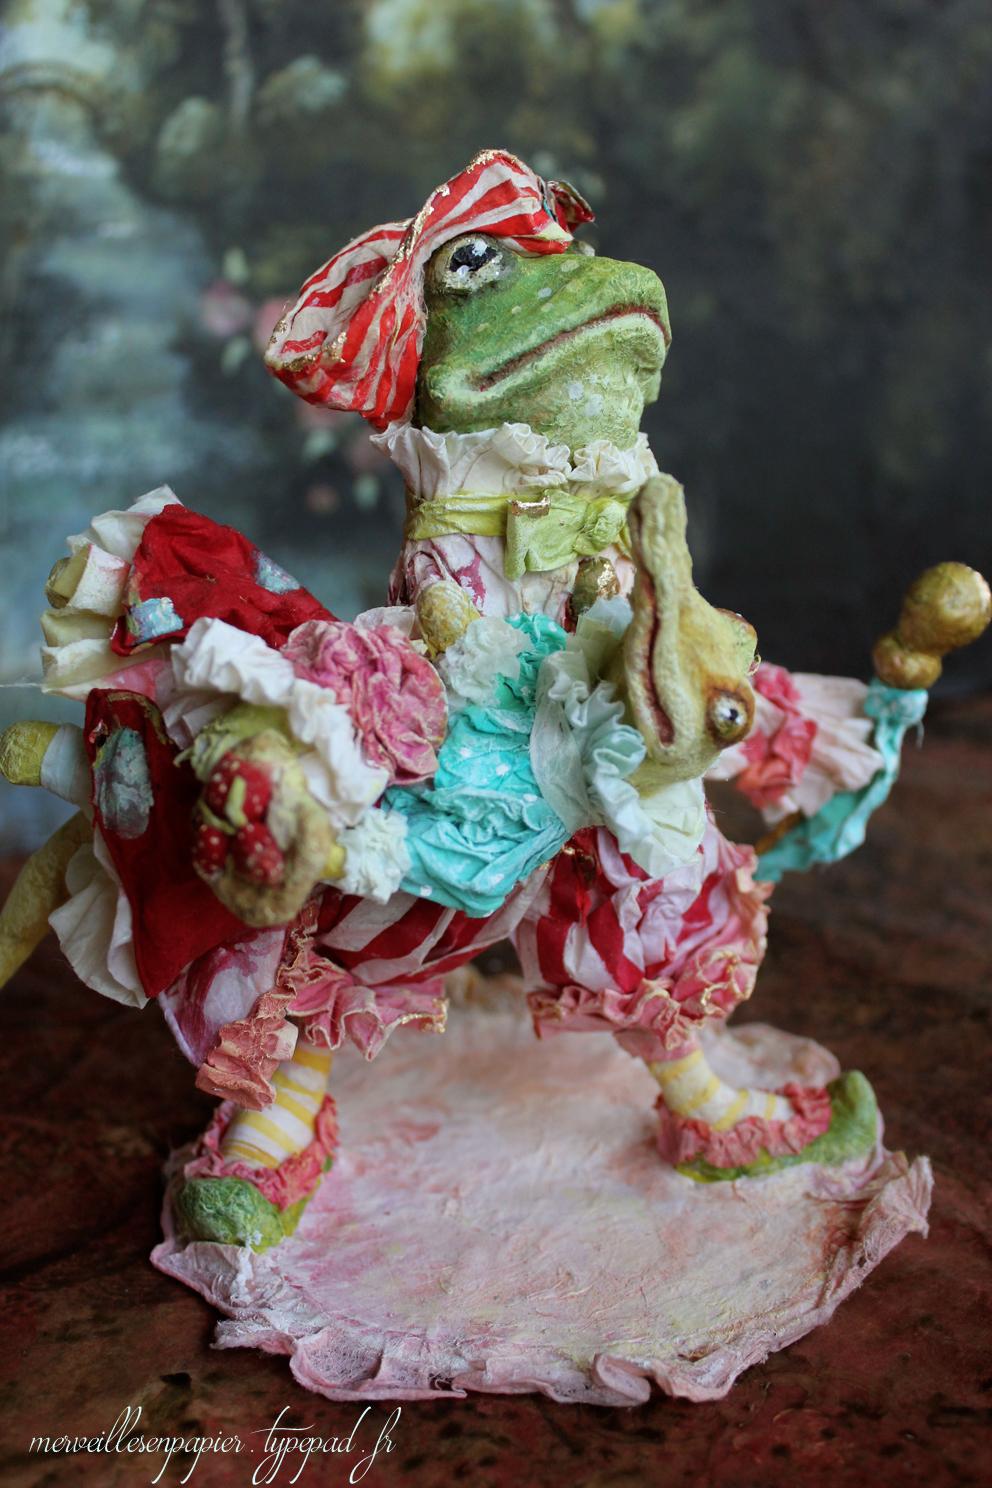 enfant-grenouille-croco-1.jpg